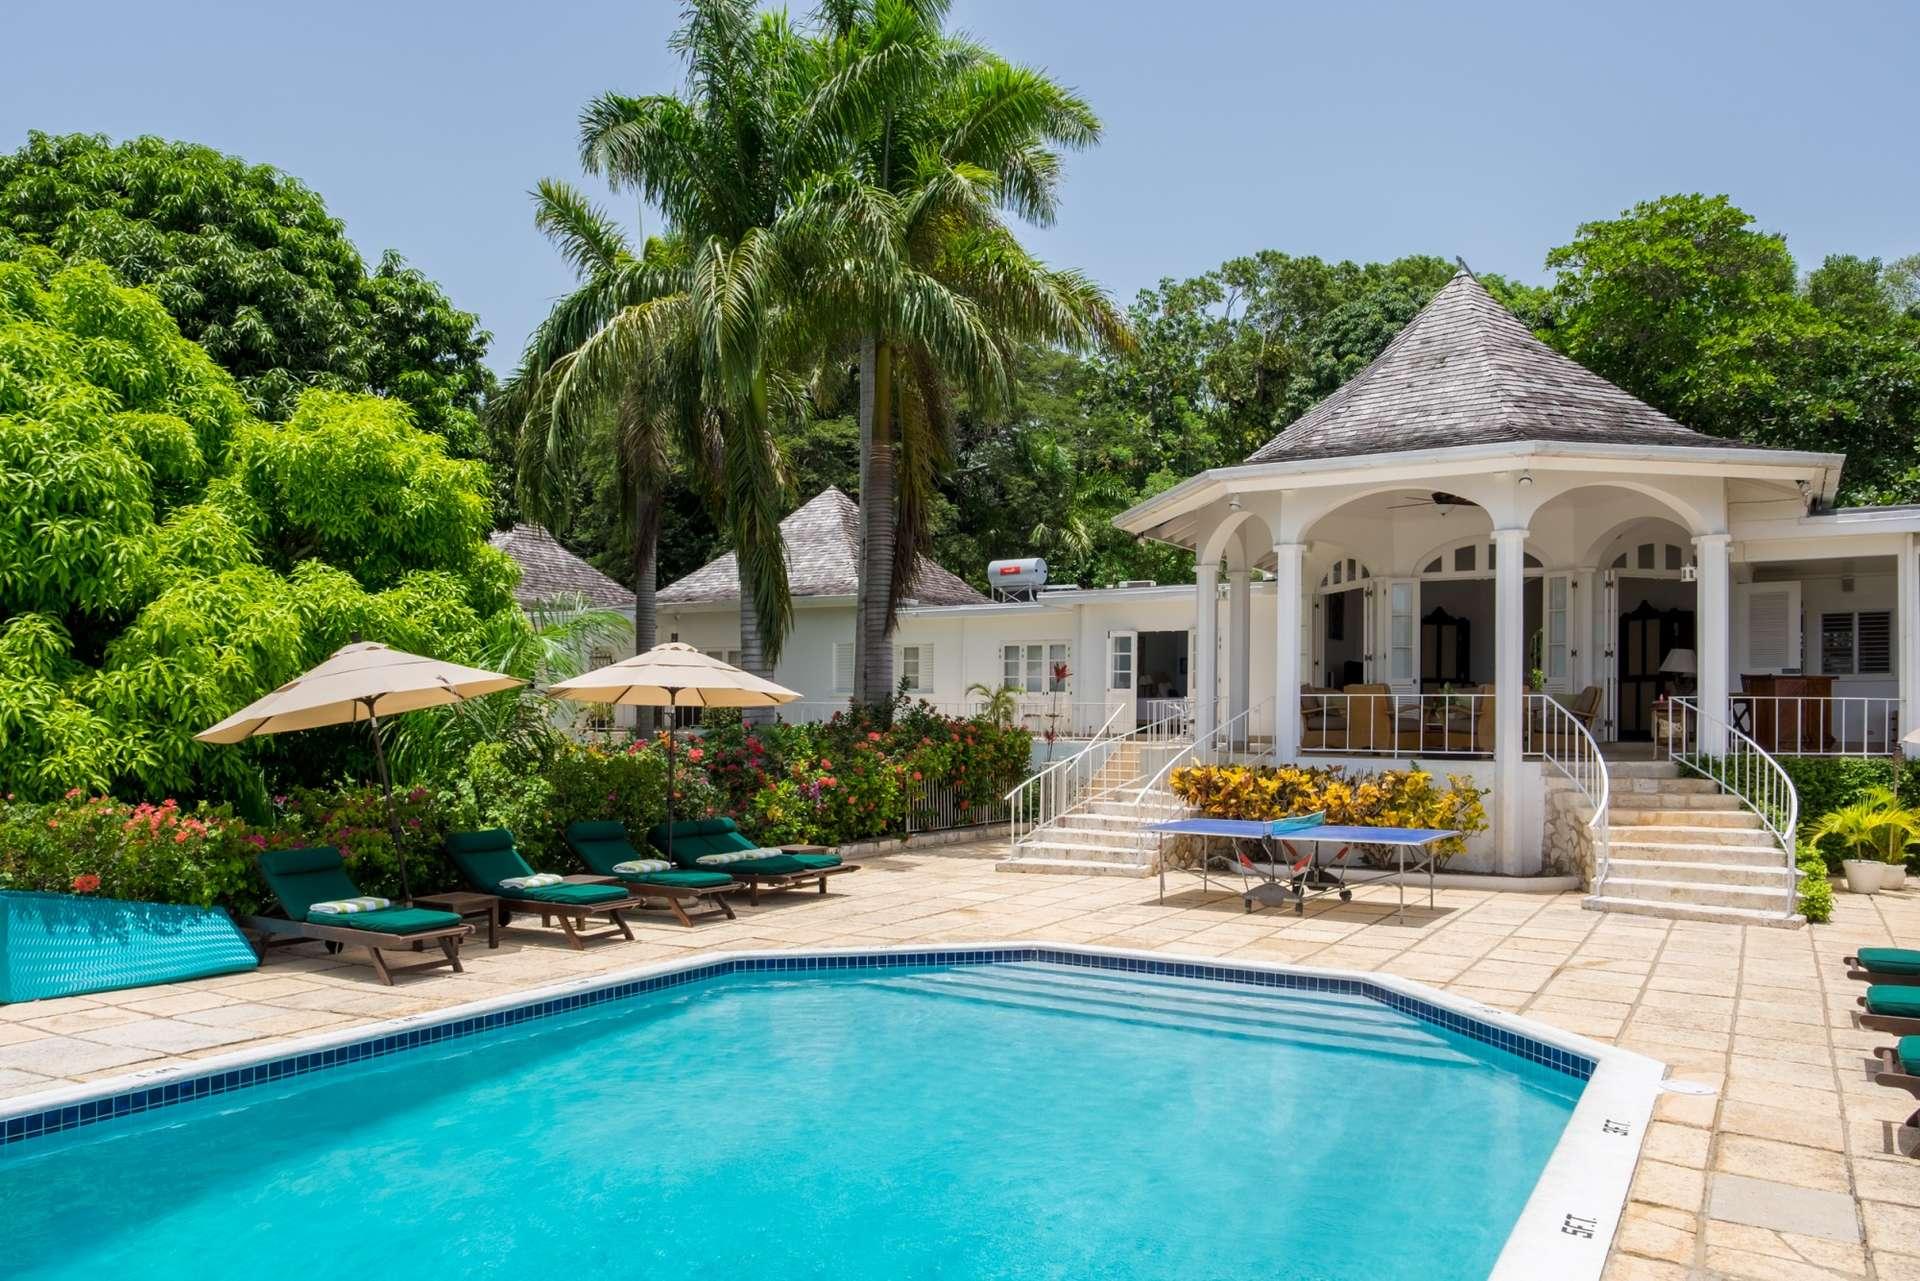 Luxury villa rentals caribbean - Jamaica - Montego bay - Nutmeg Villa - Image 1/17